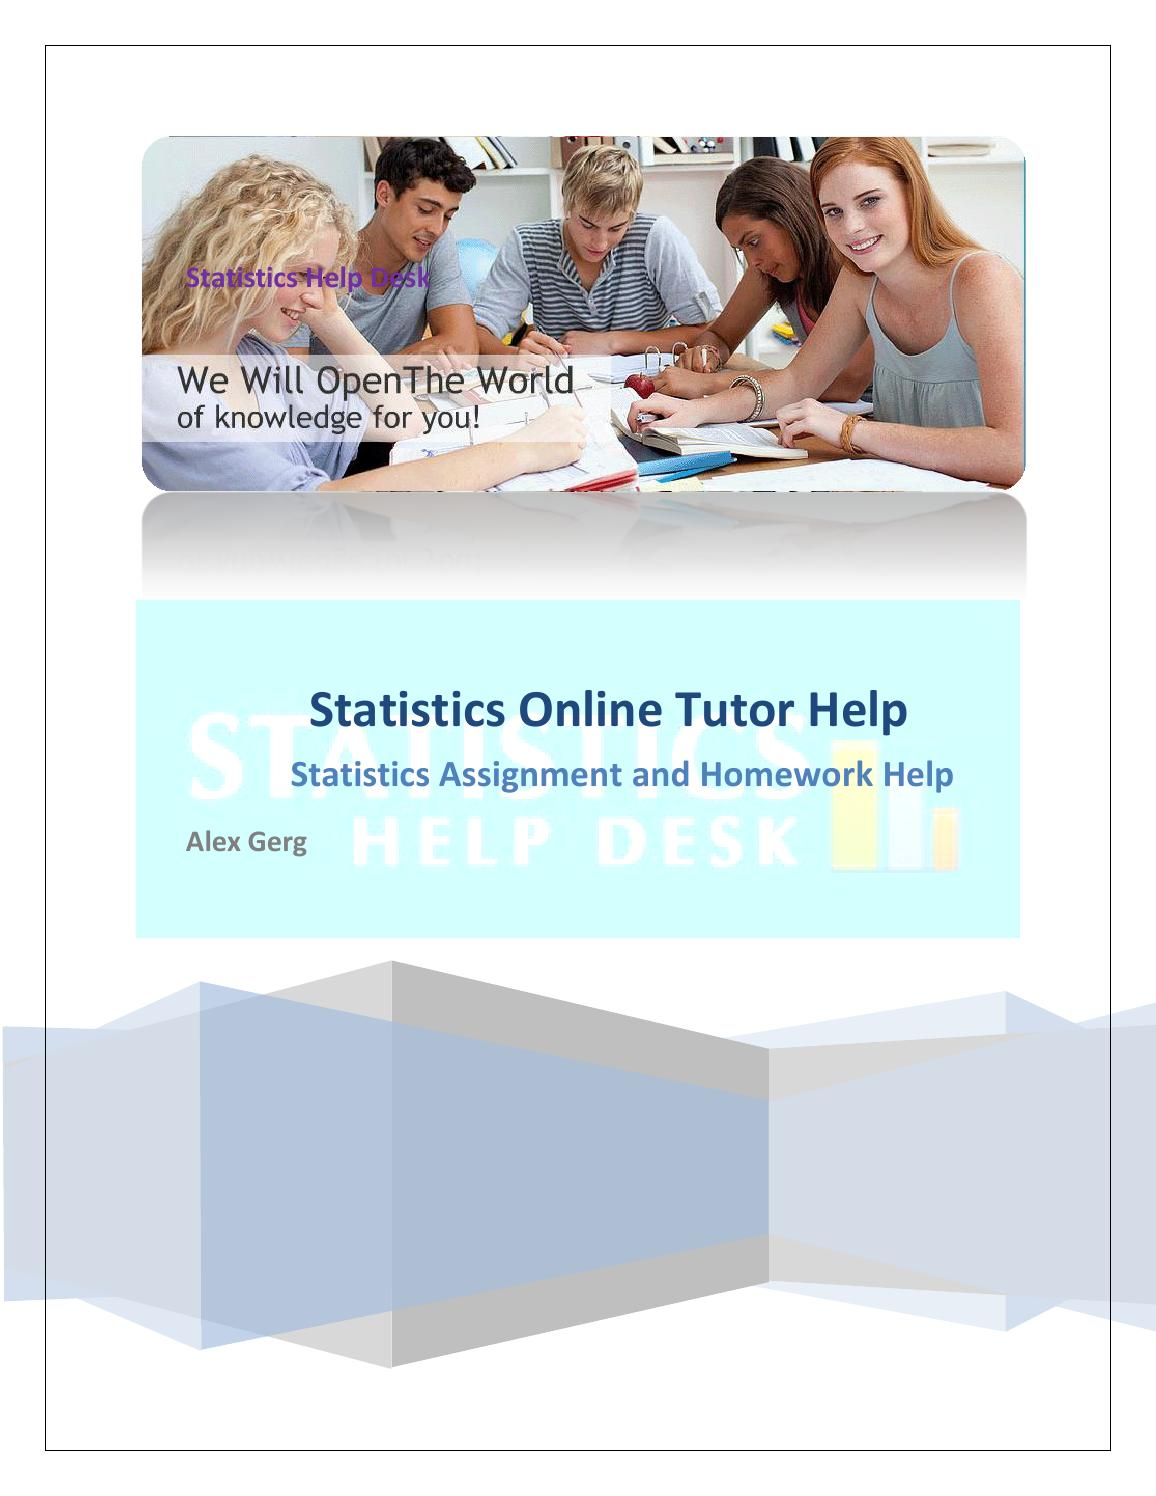 college statistics tutor